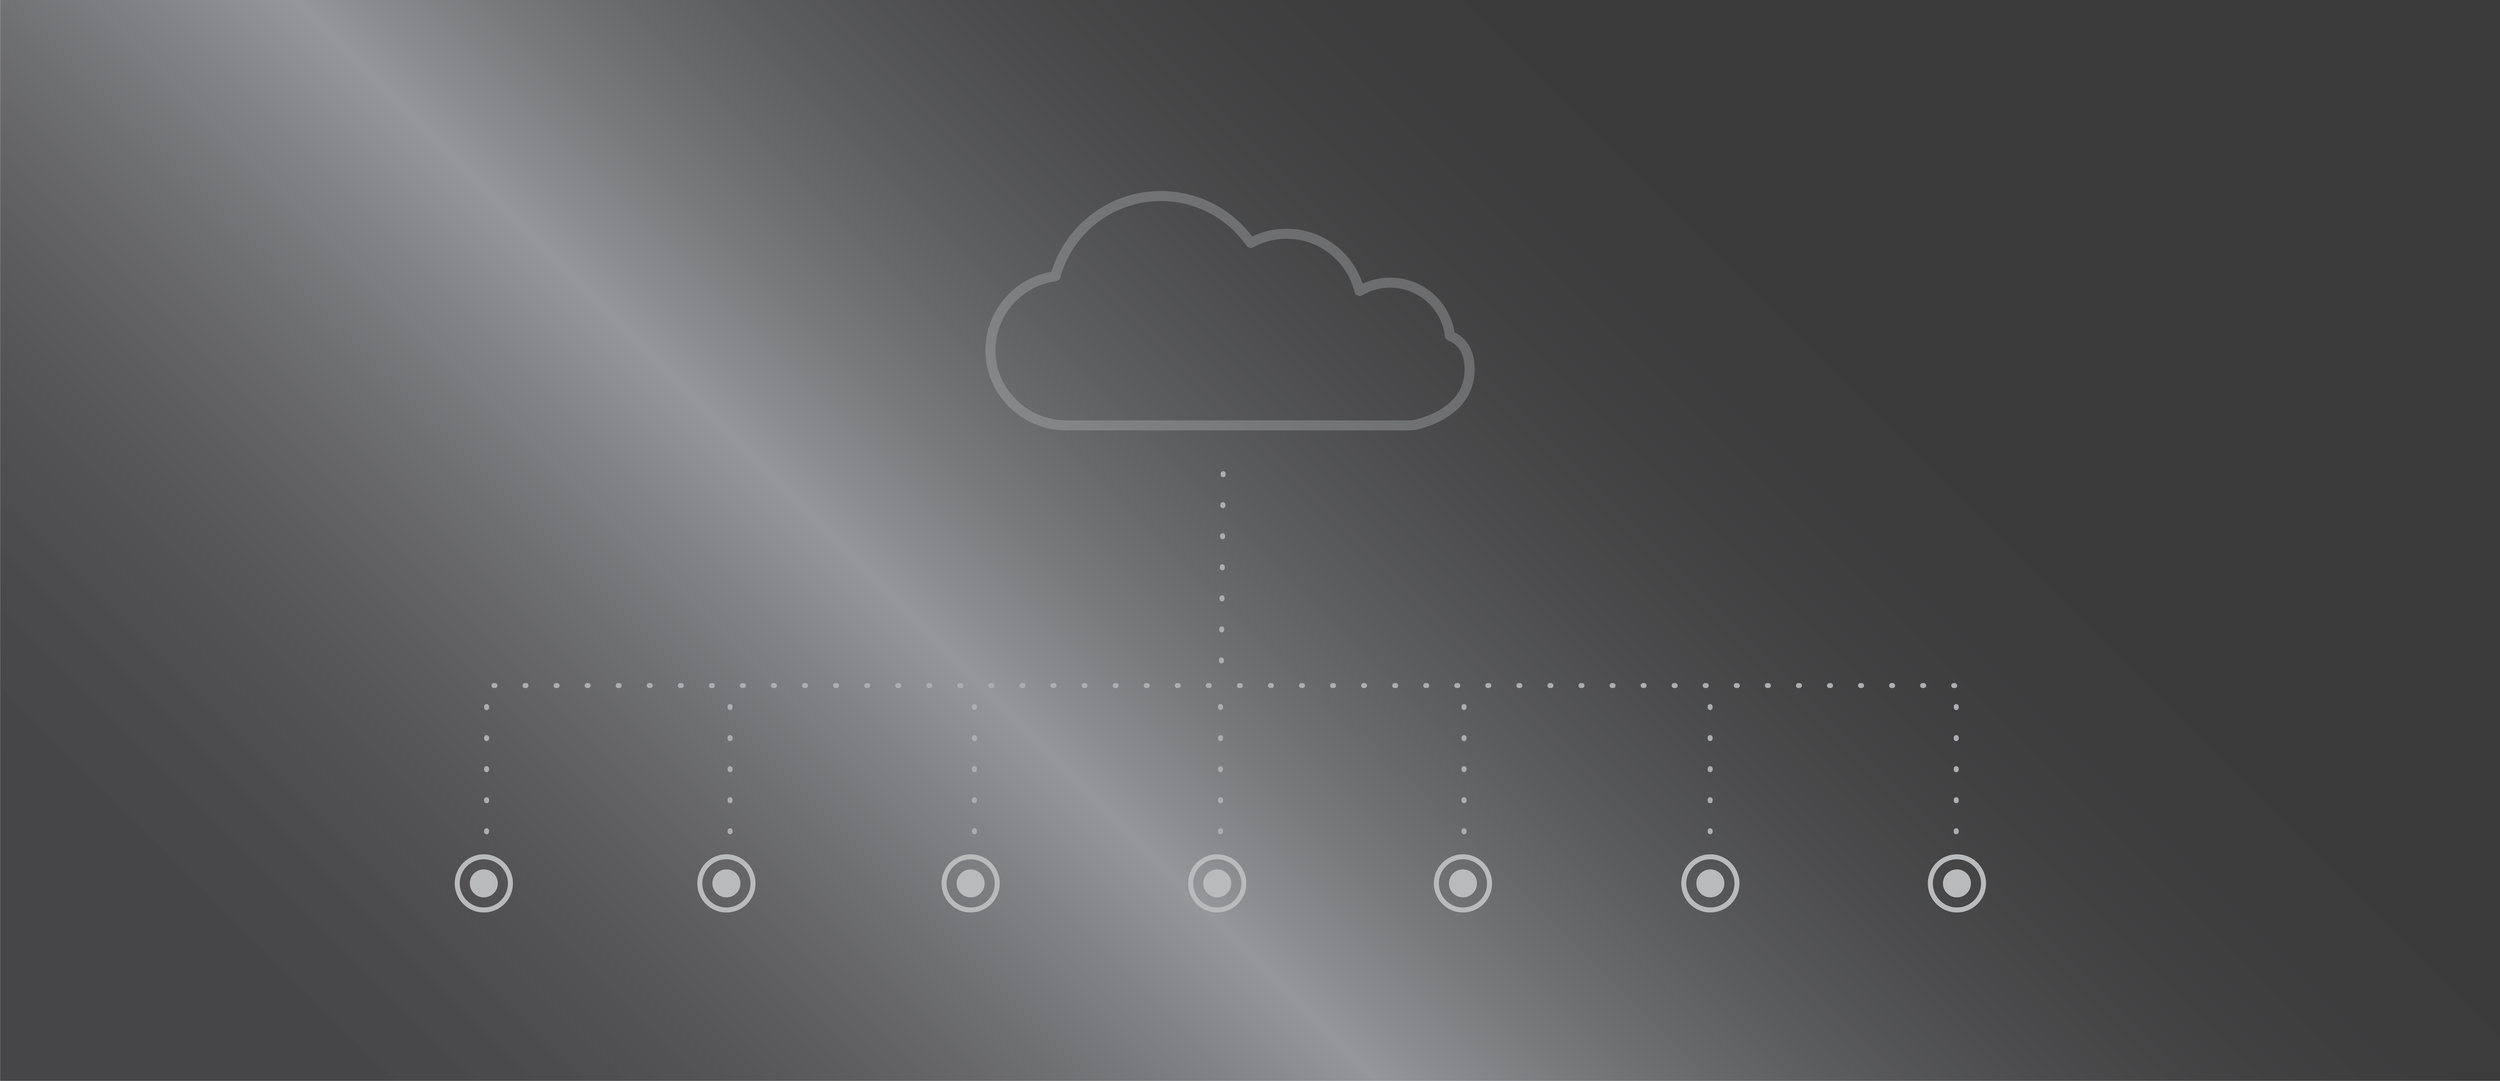 Palo Alto Networks TRAPS hero image